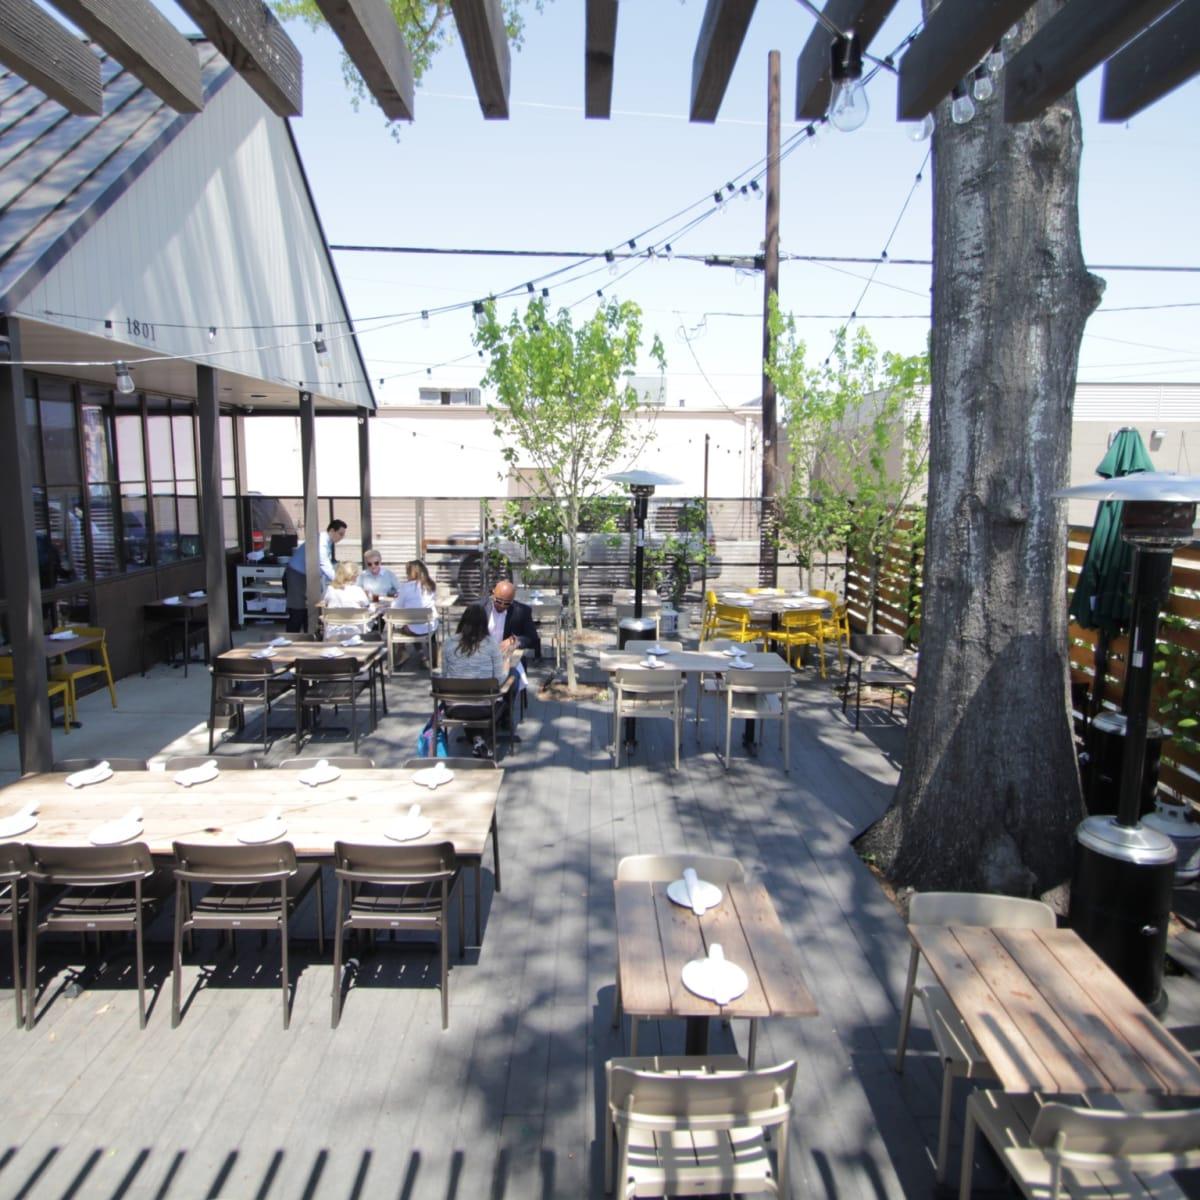 Bernadine's patio